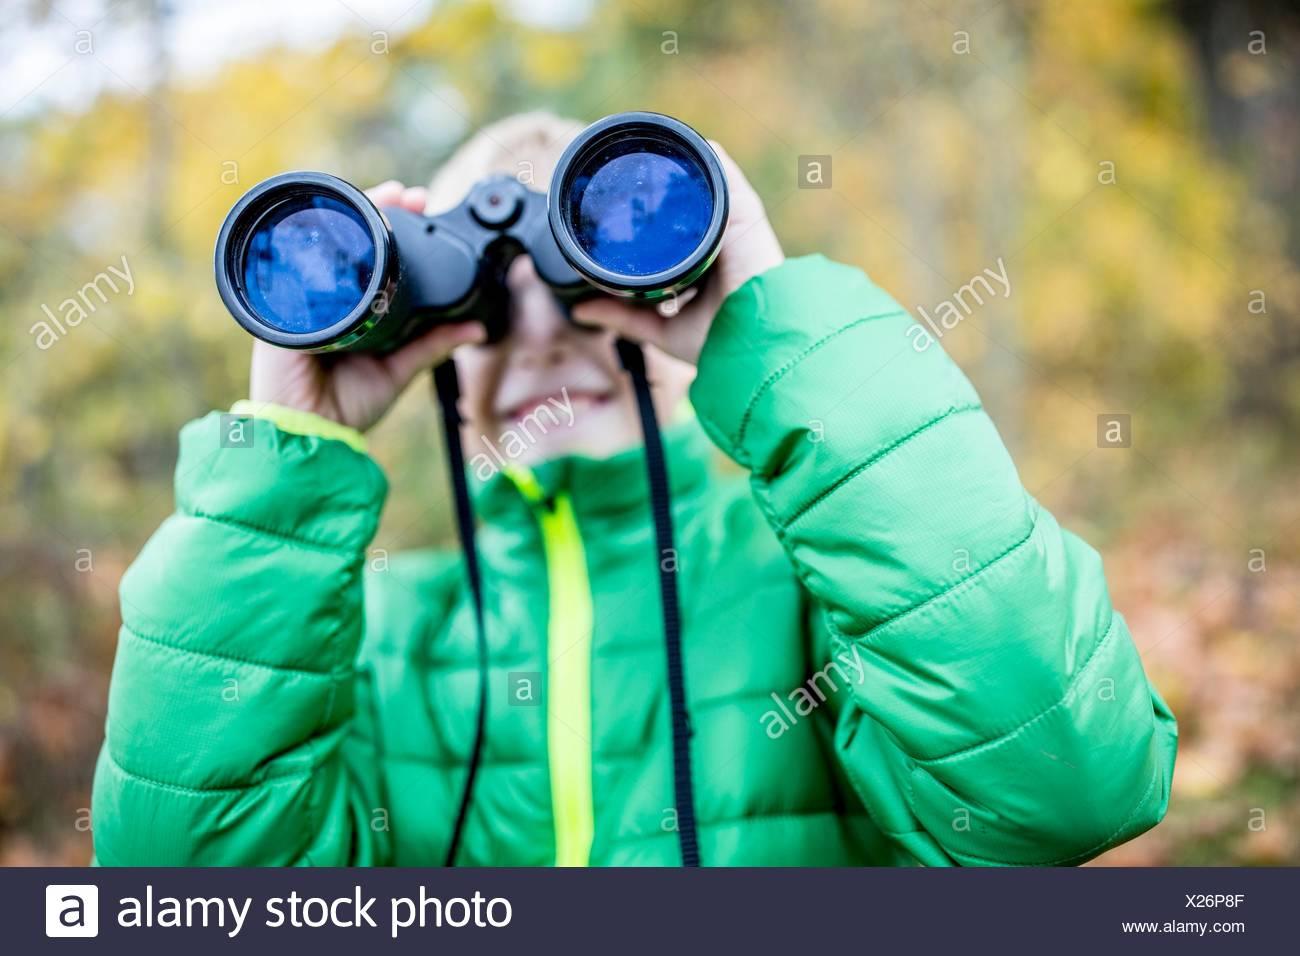 MODEL RELEASED. Boy looking through binoculars, close-up. - Stock Image